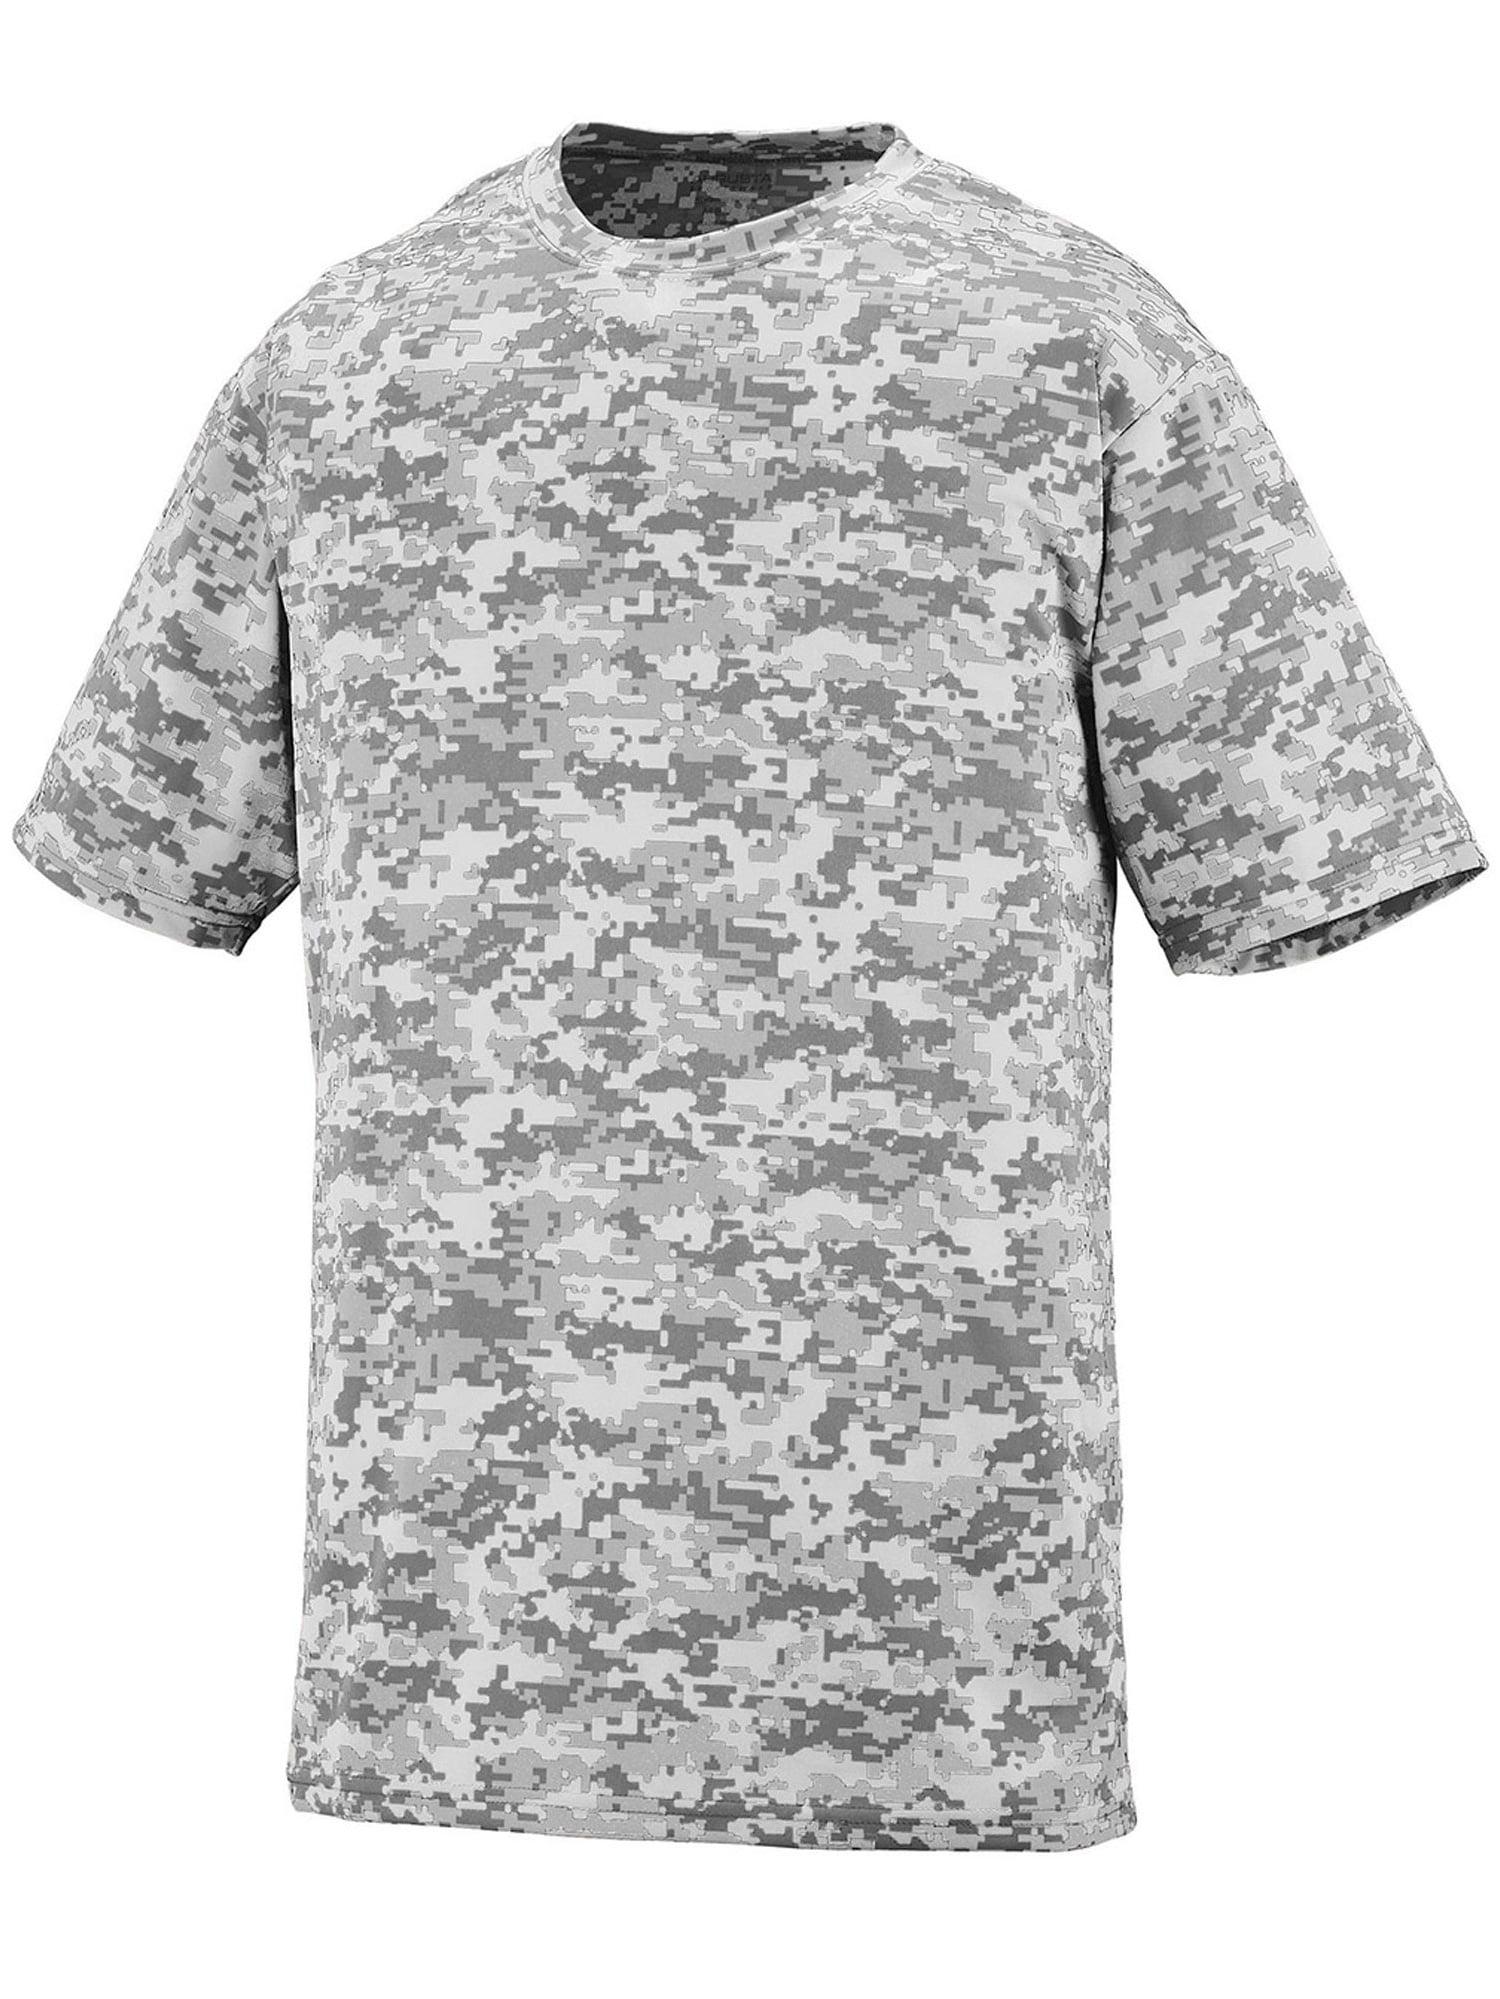 Augusta Men's Digi Camo Wicking T-Shirt, Style 1798A